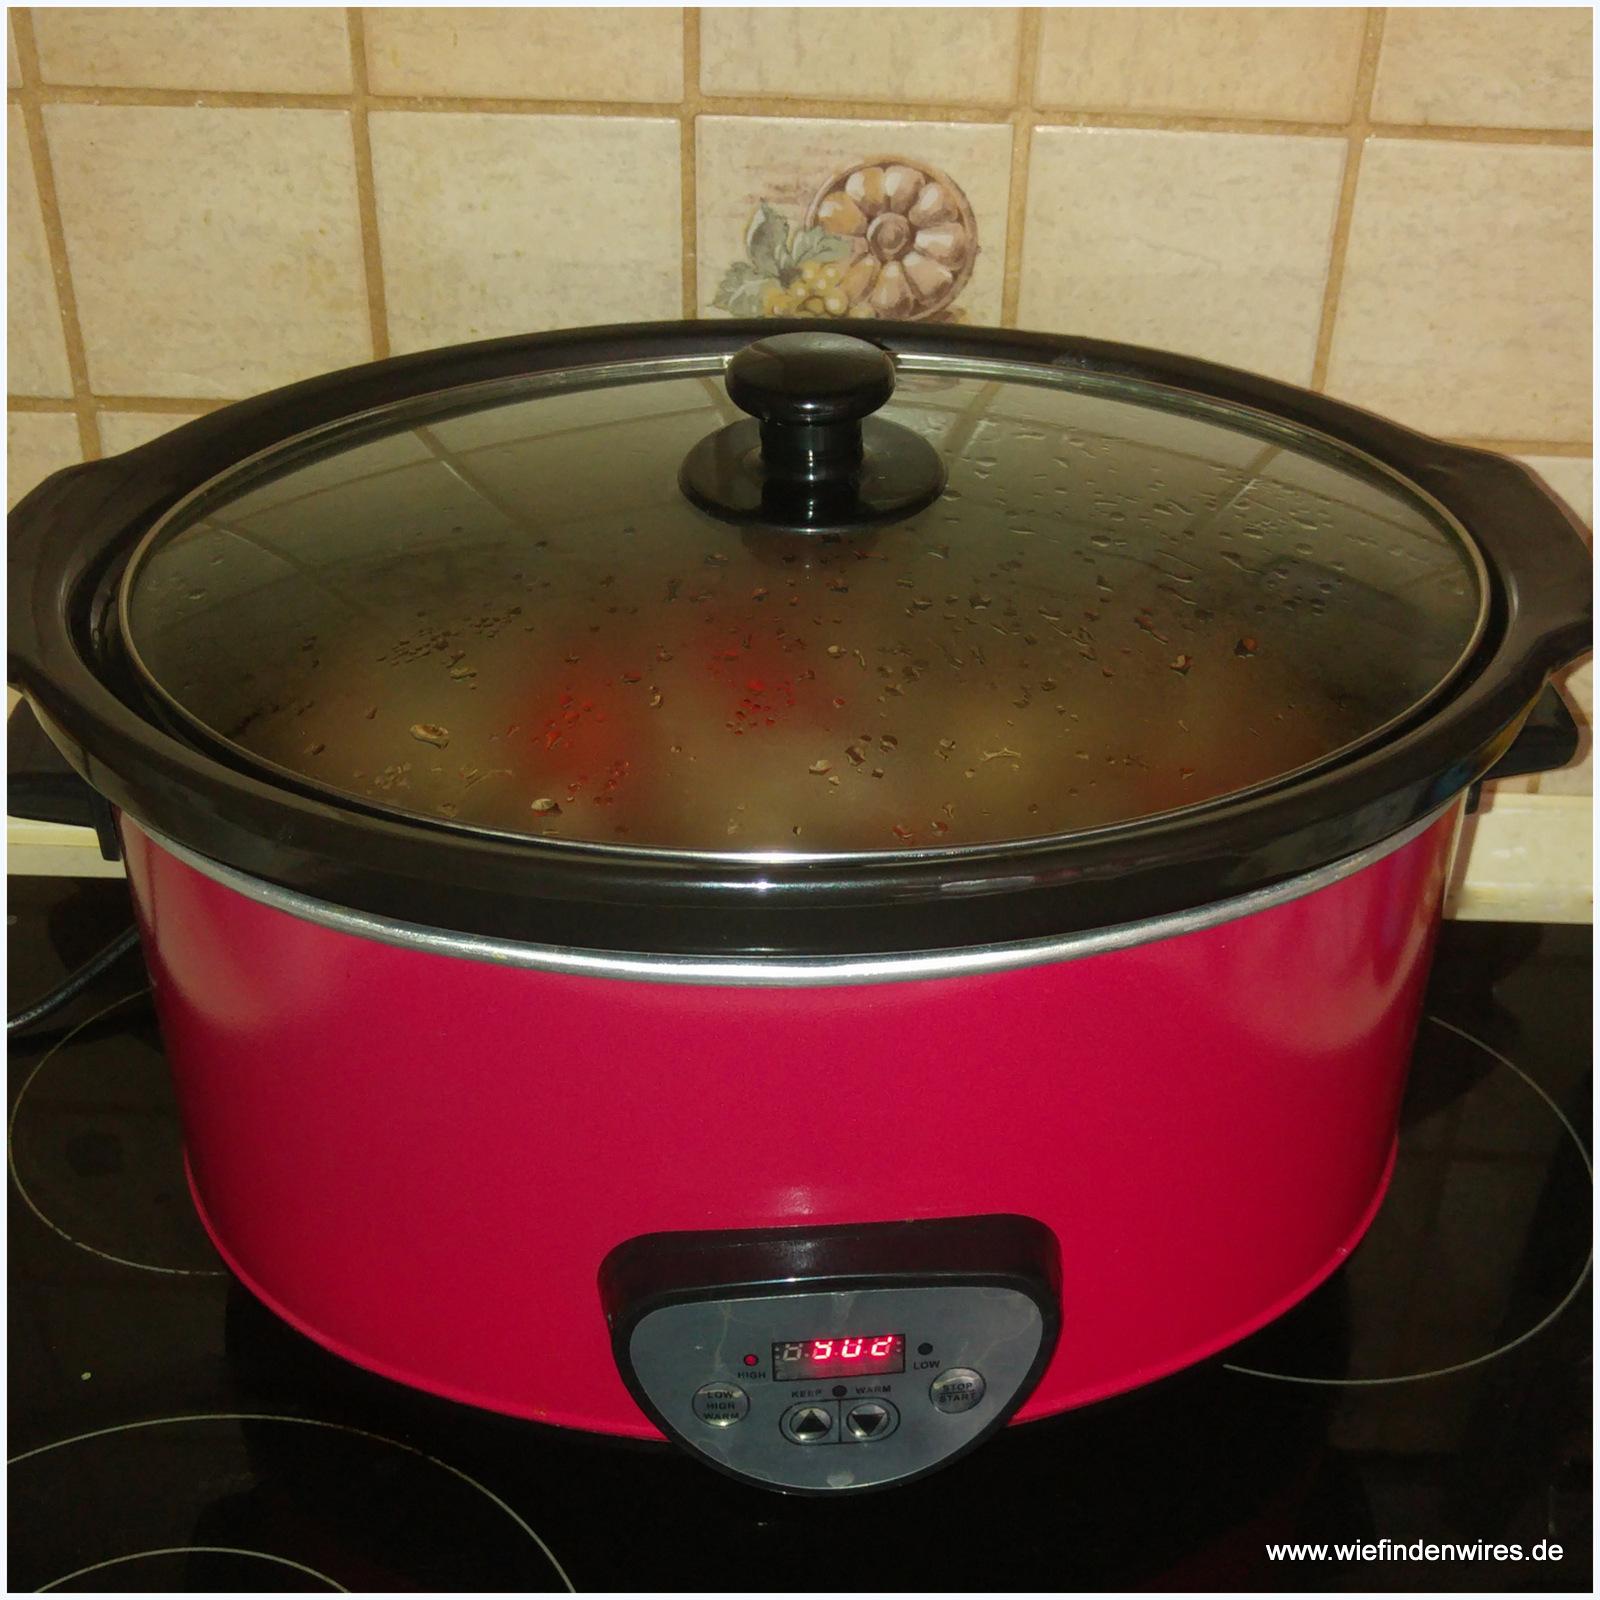 Bankett Slow Cooker Schongarer Digital 6,5 Liter von Klarstein + Rezepte